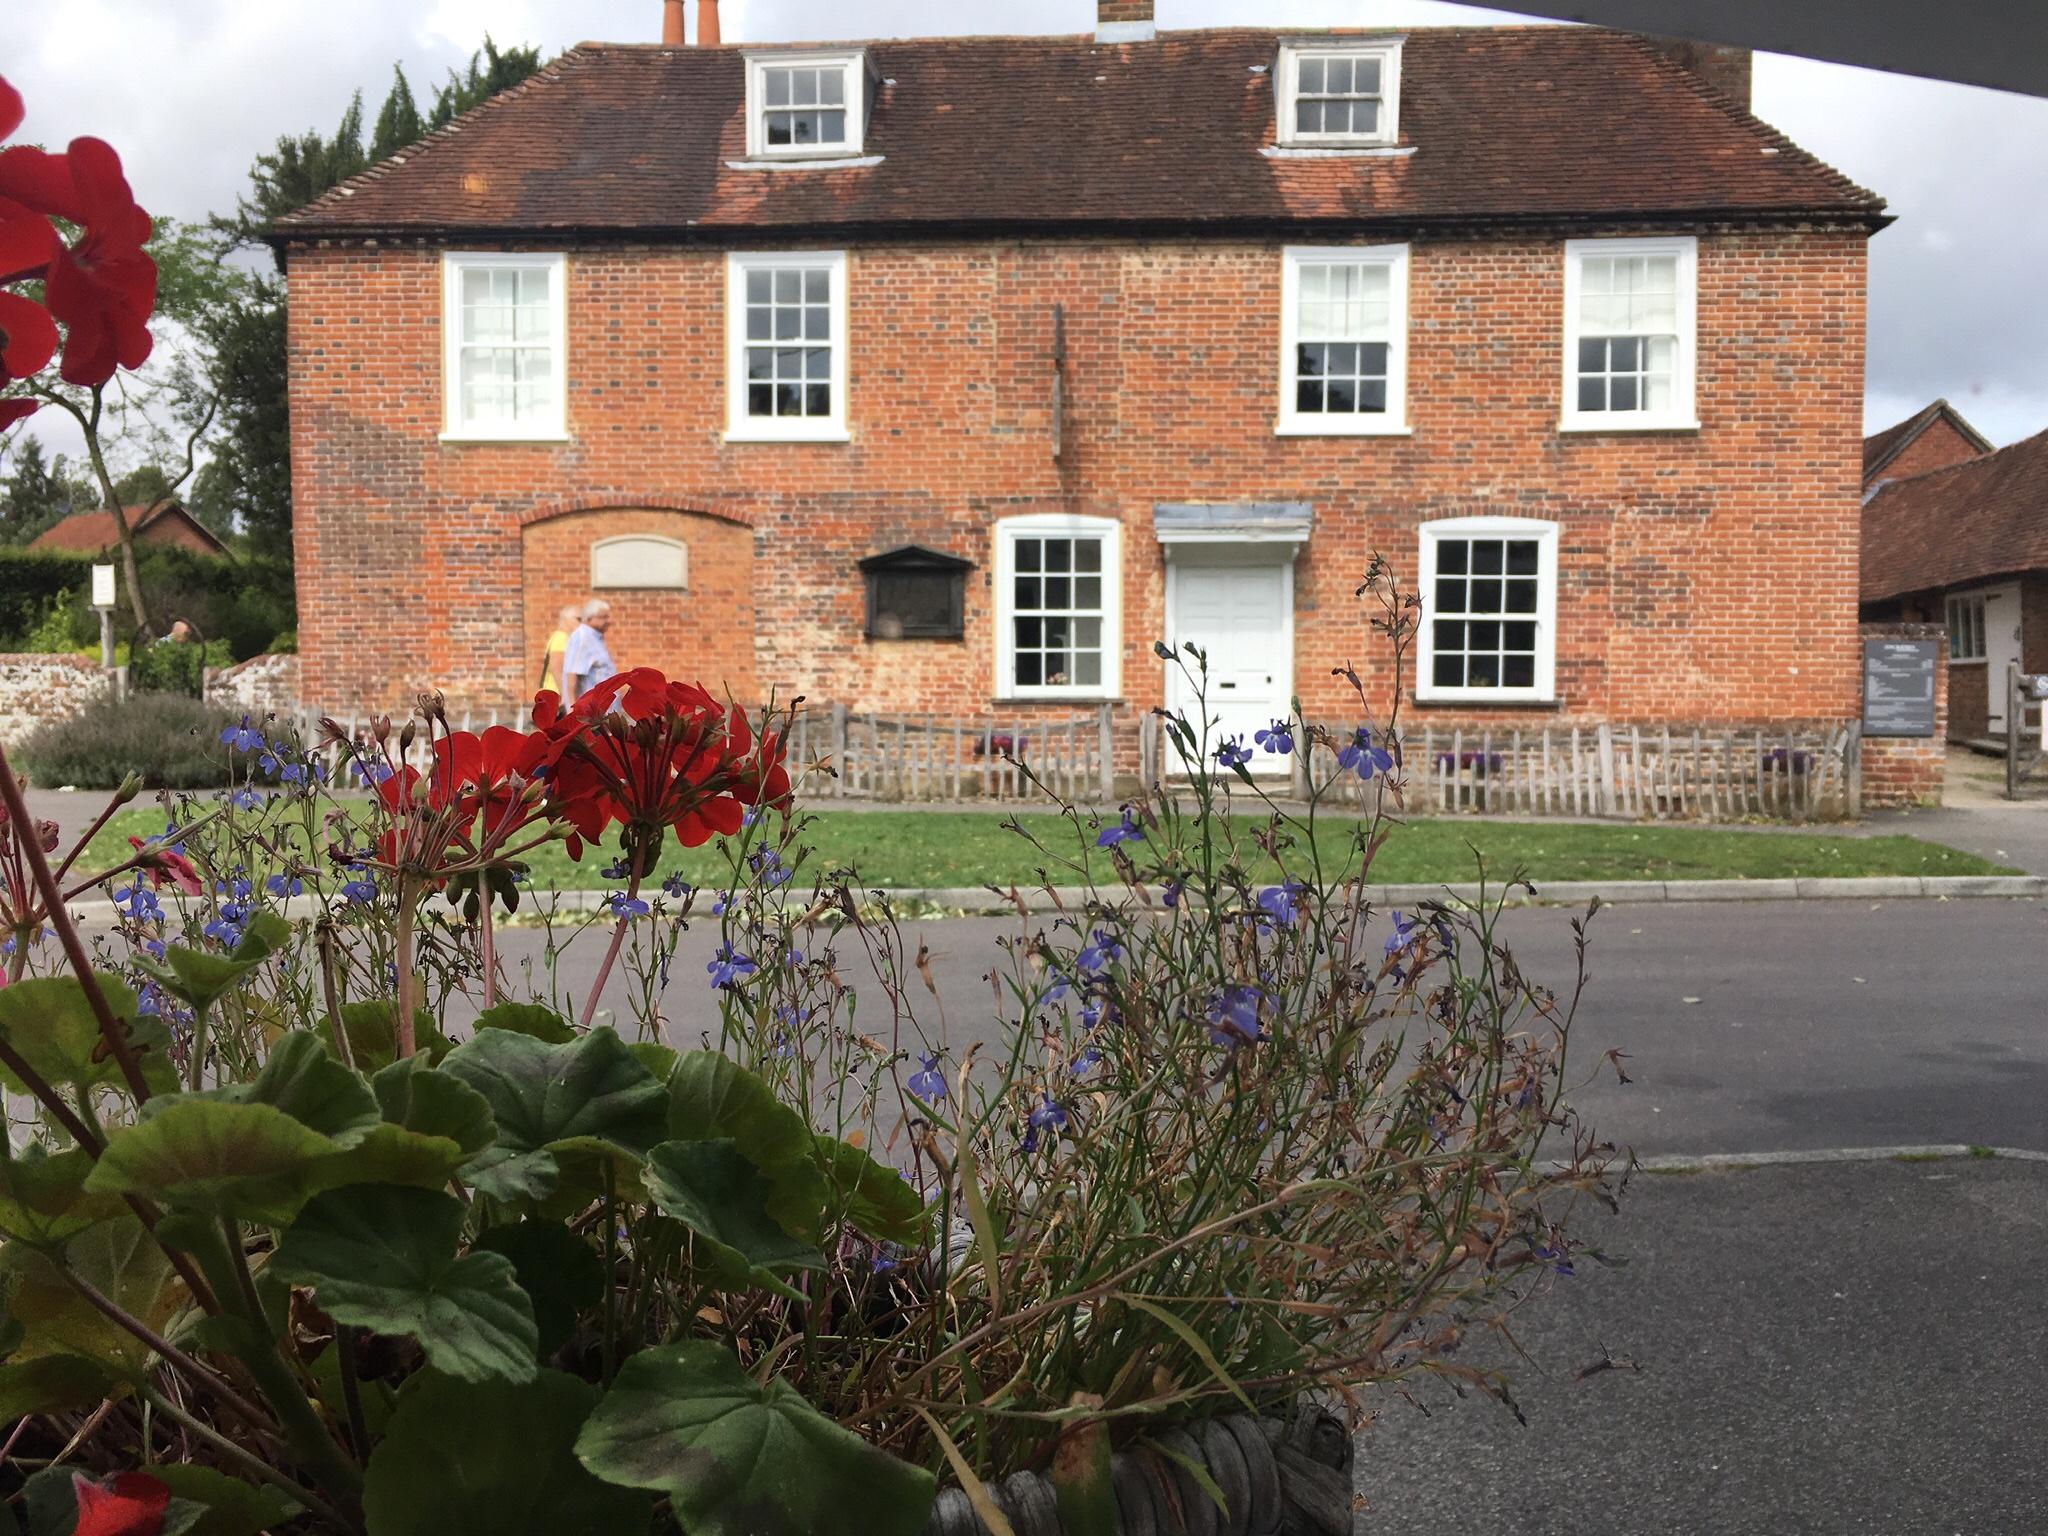 Jane Austen's House Museum, Chawton, Hampshire, England